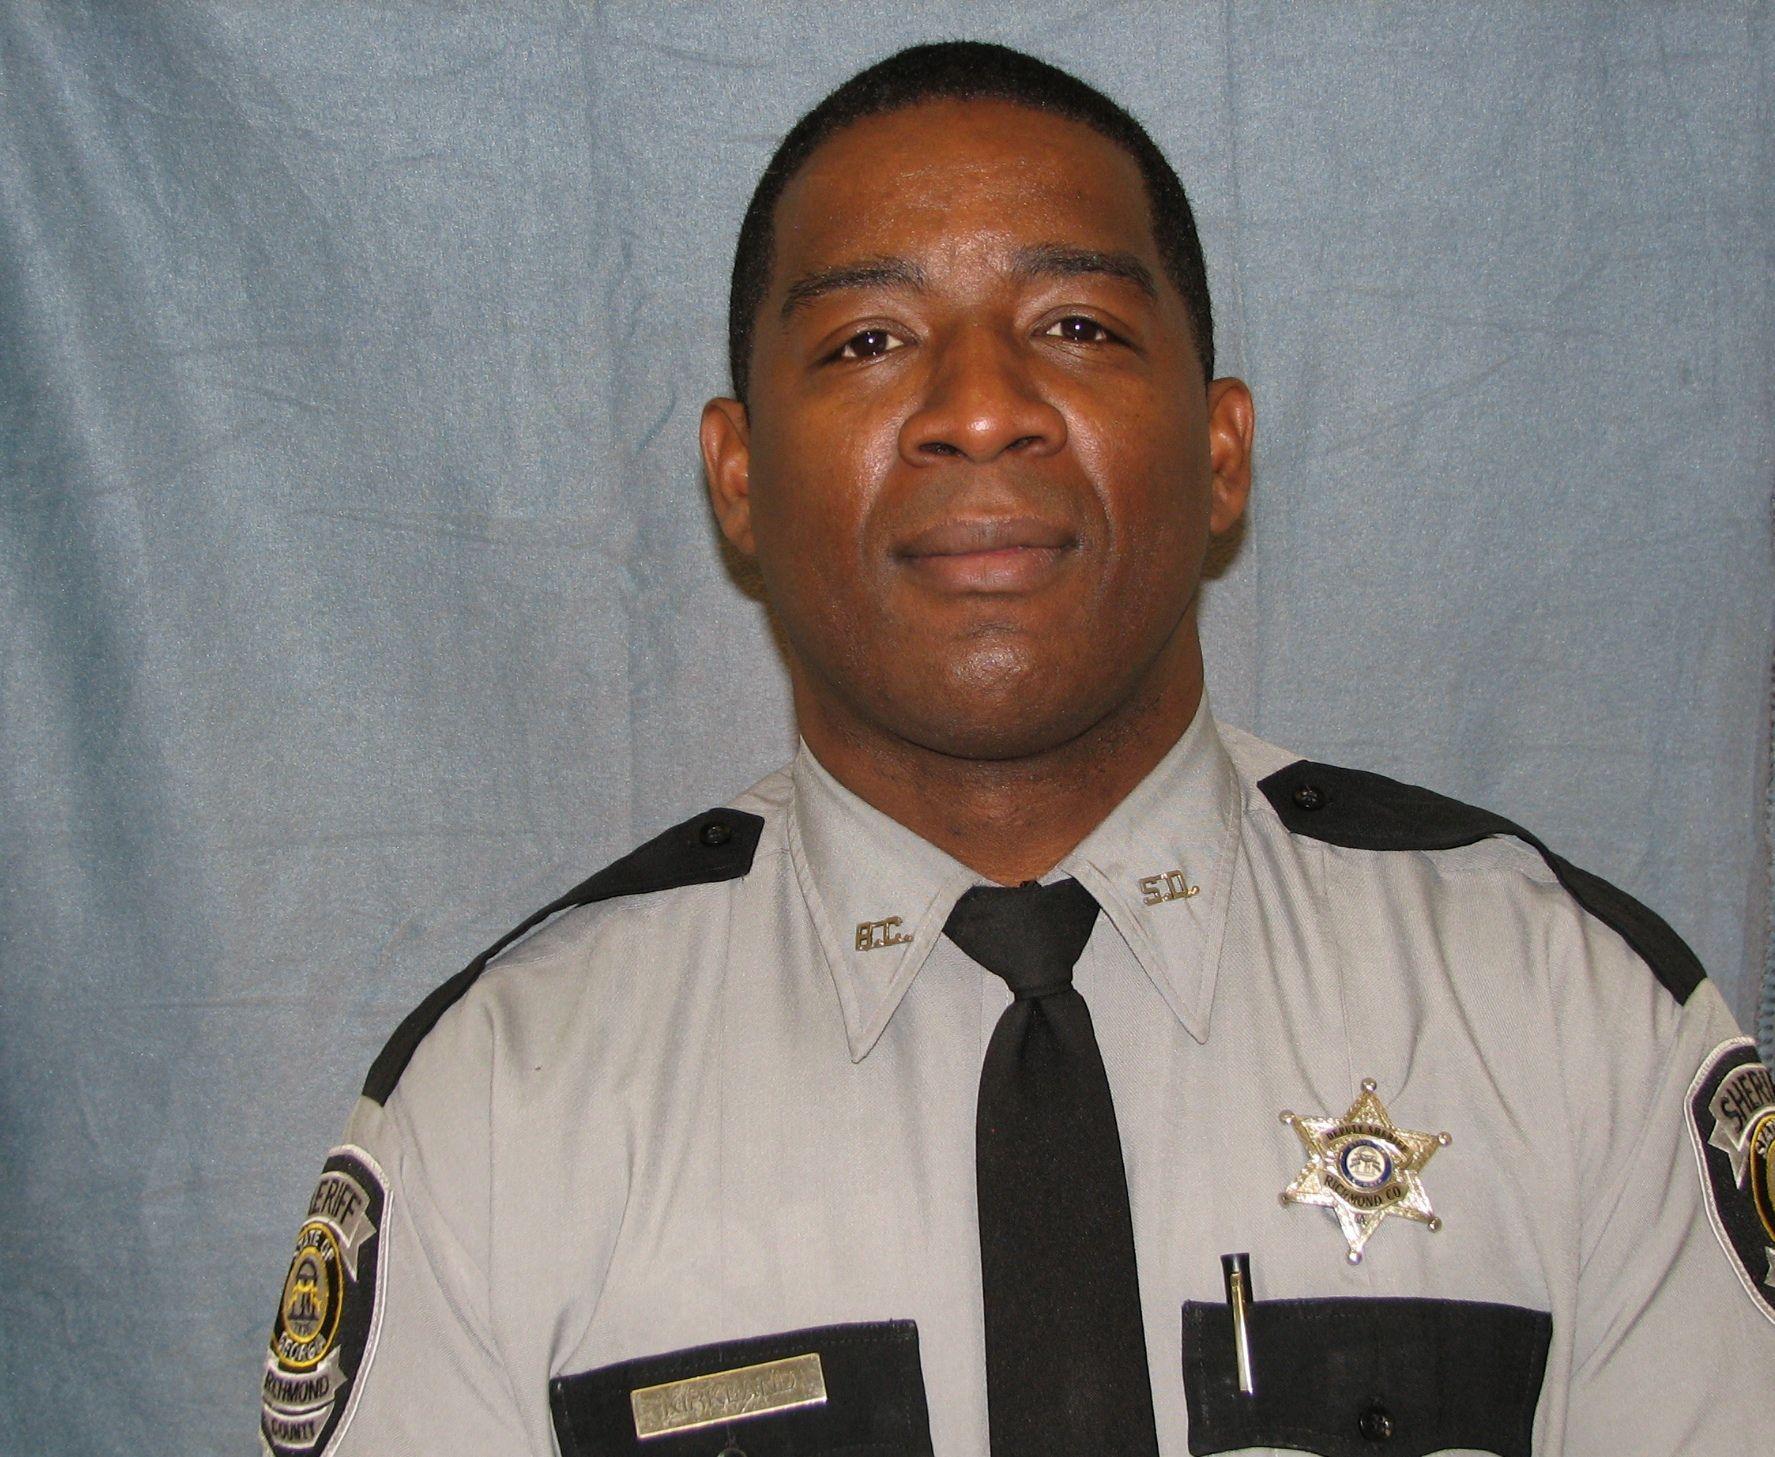 Deputy Kirkland (Source: Richmond County Sheriff's Office)